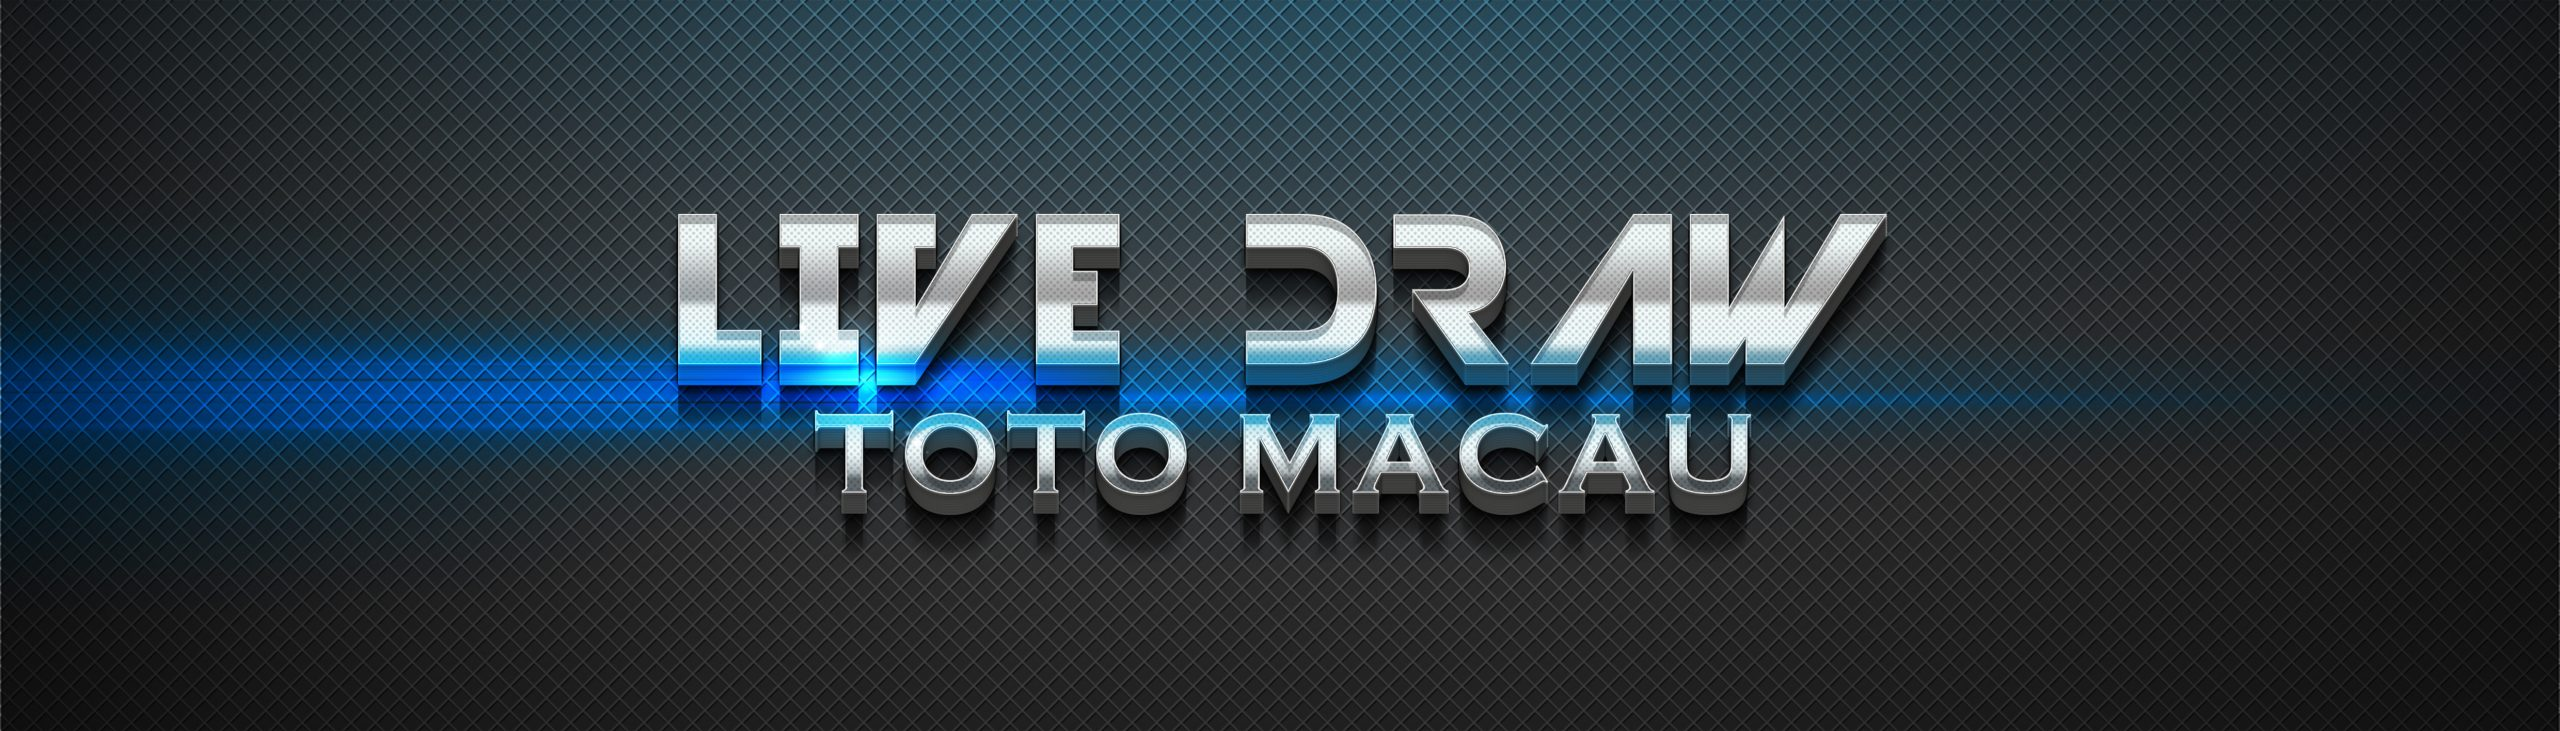 Live Draw Toto Macau - Live Result Toto Macau